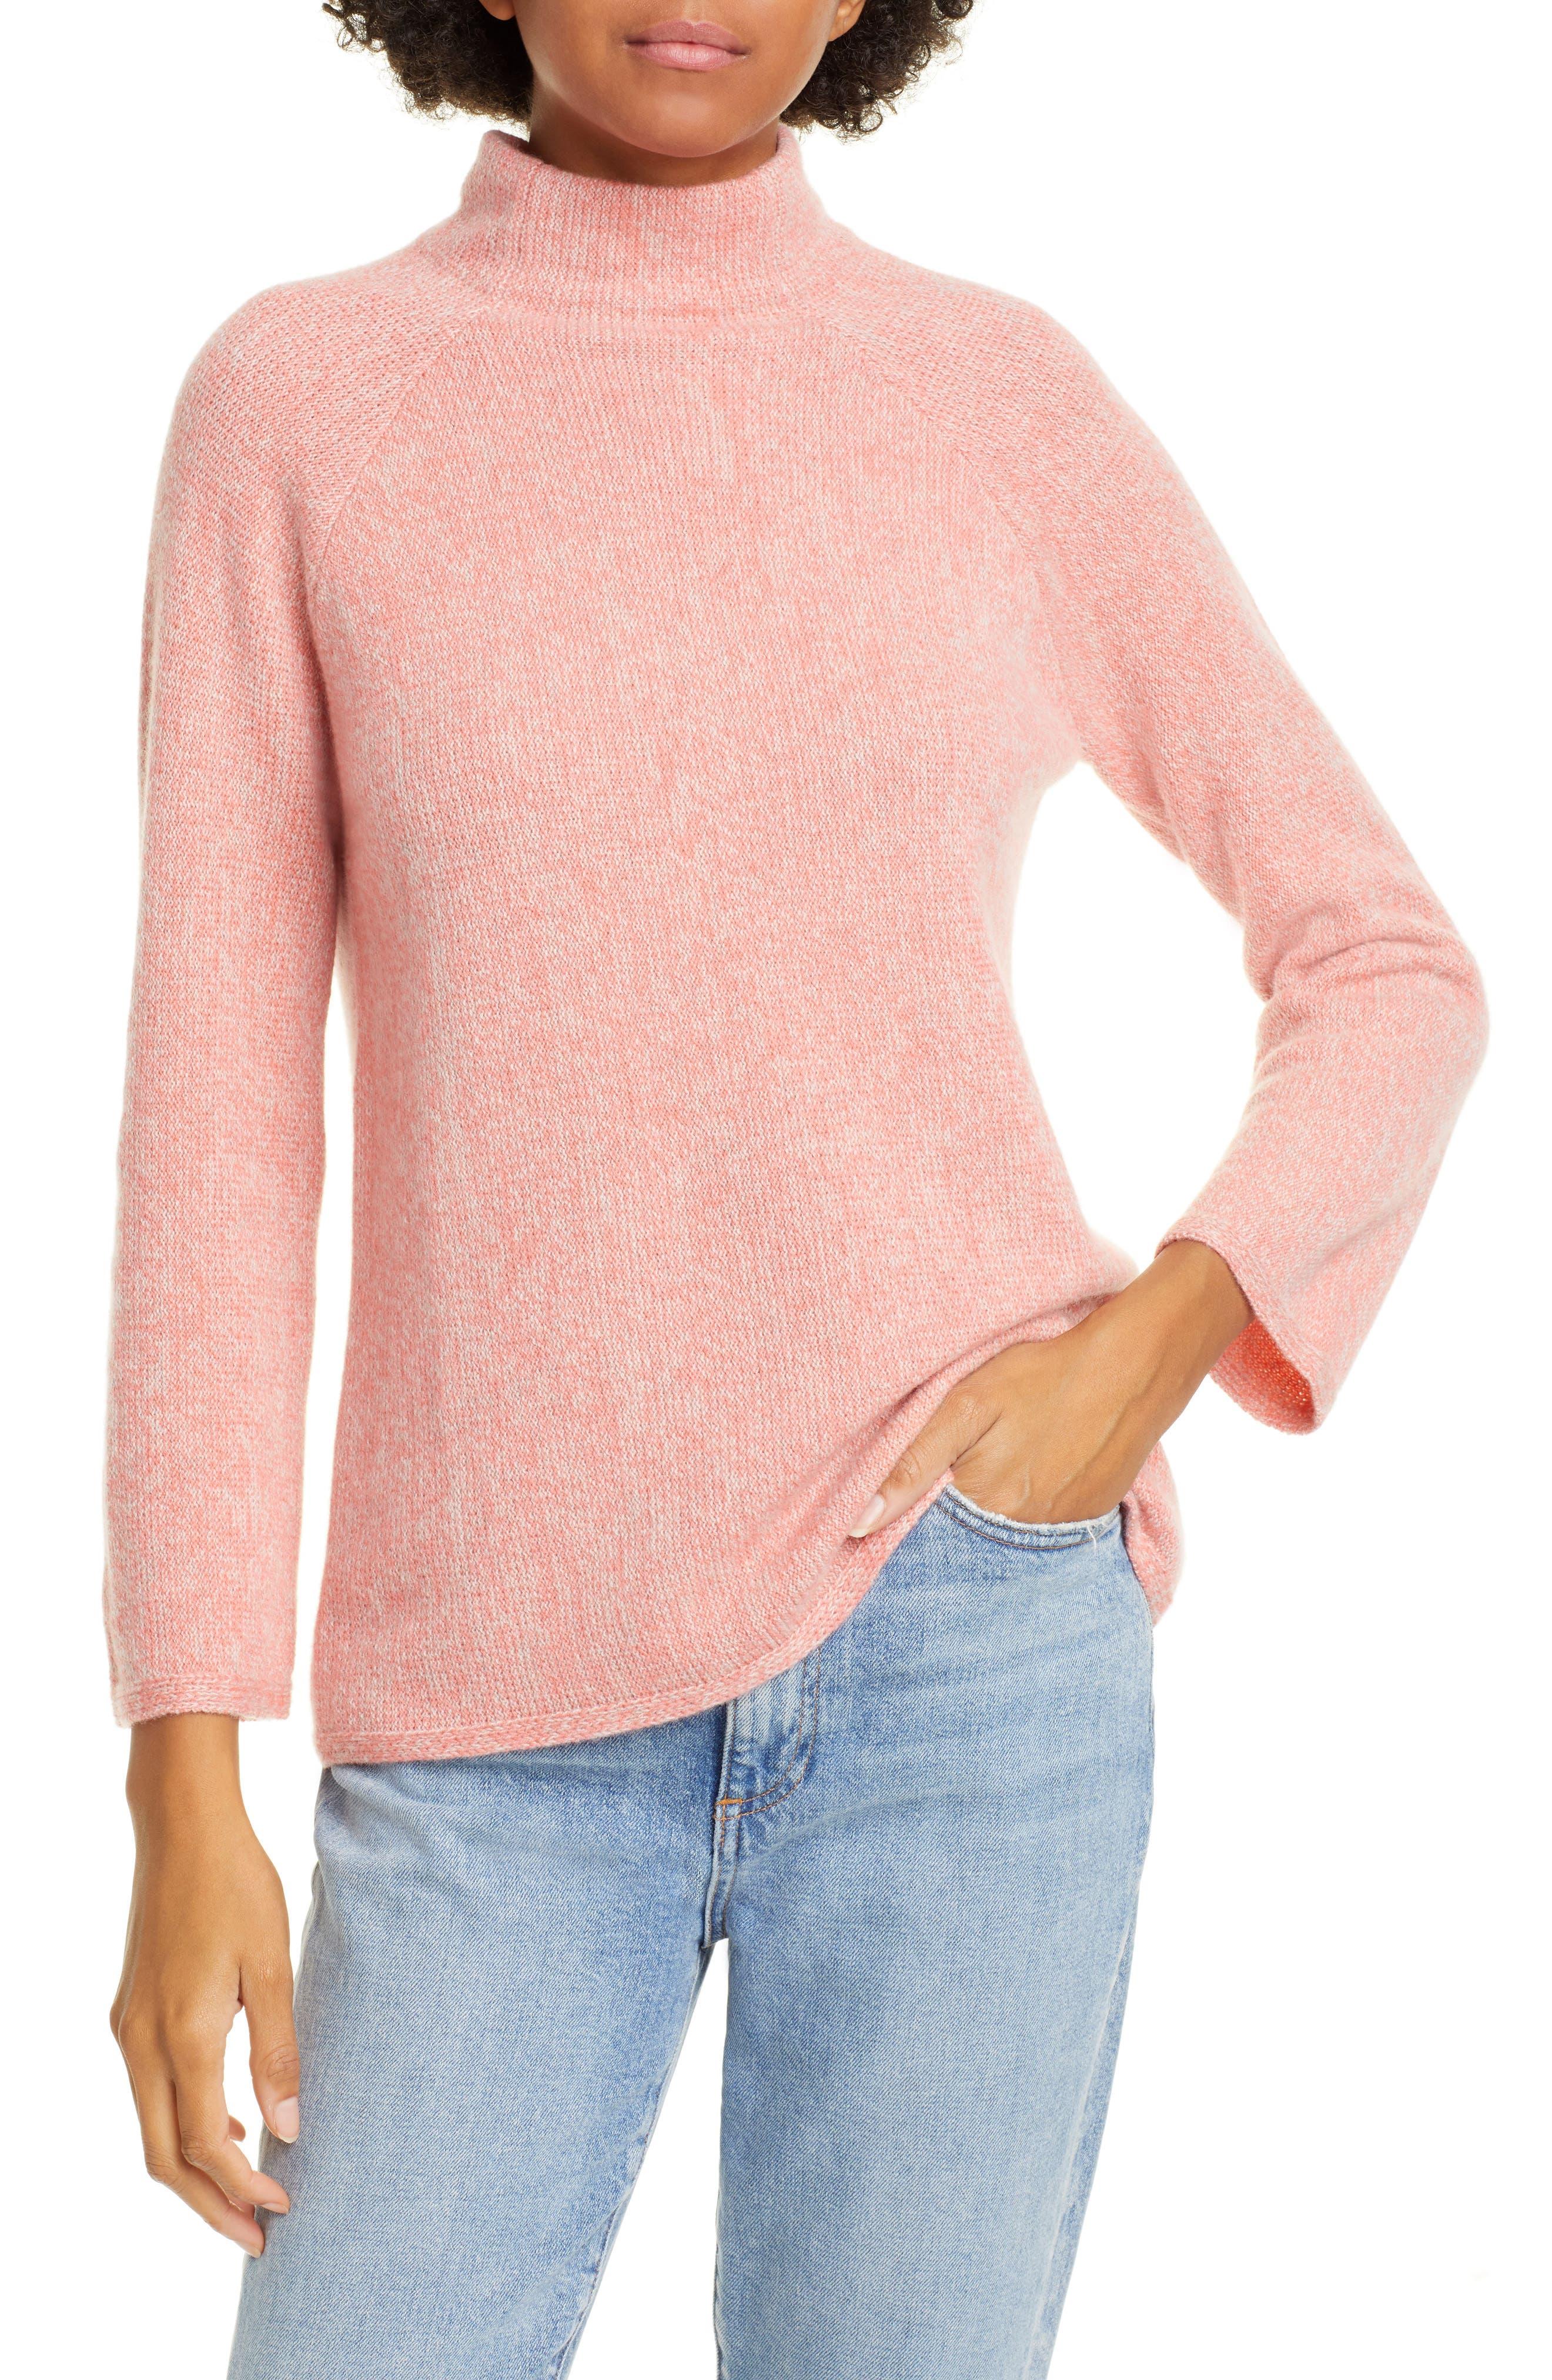 Image of Kinross Marled Mock Neck Cashmere Sweater